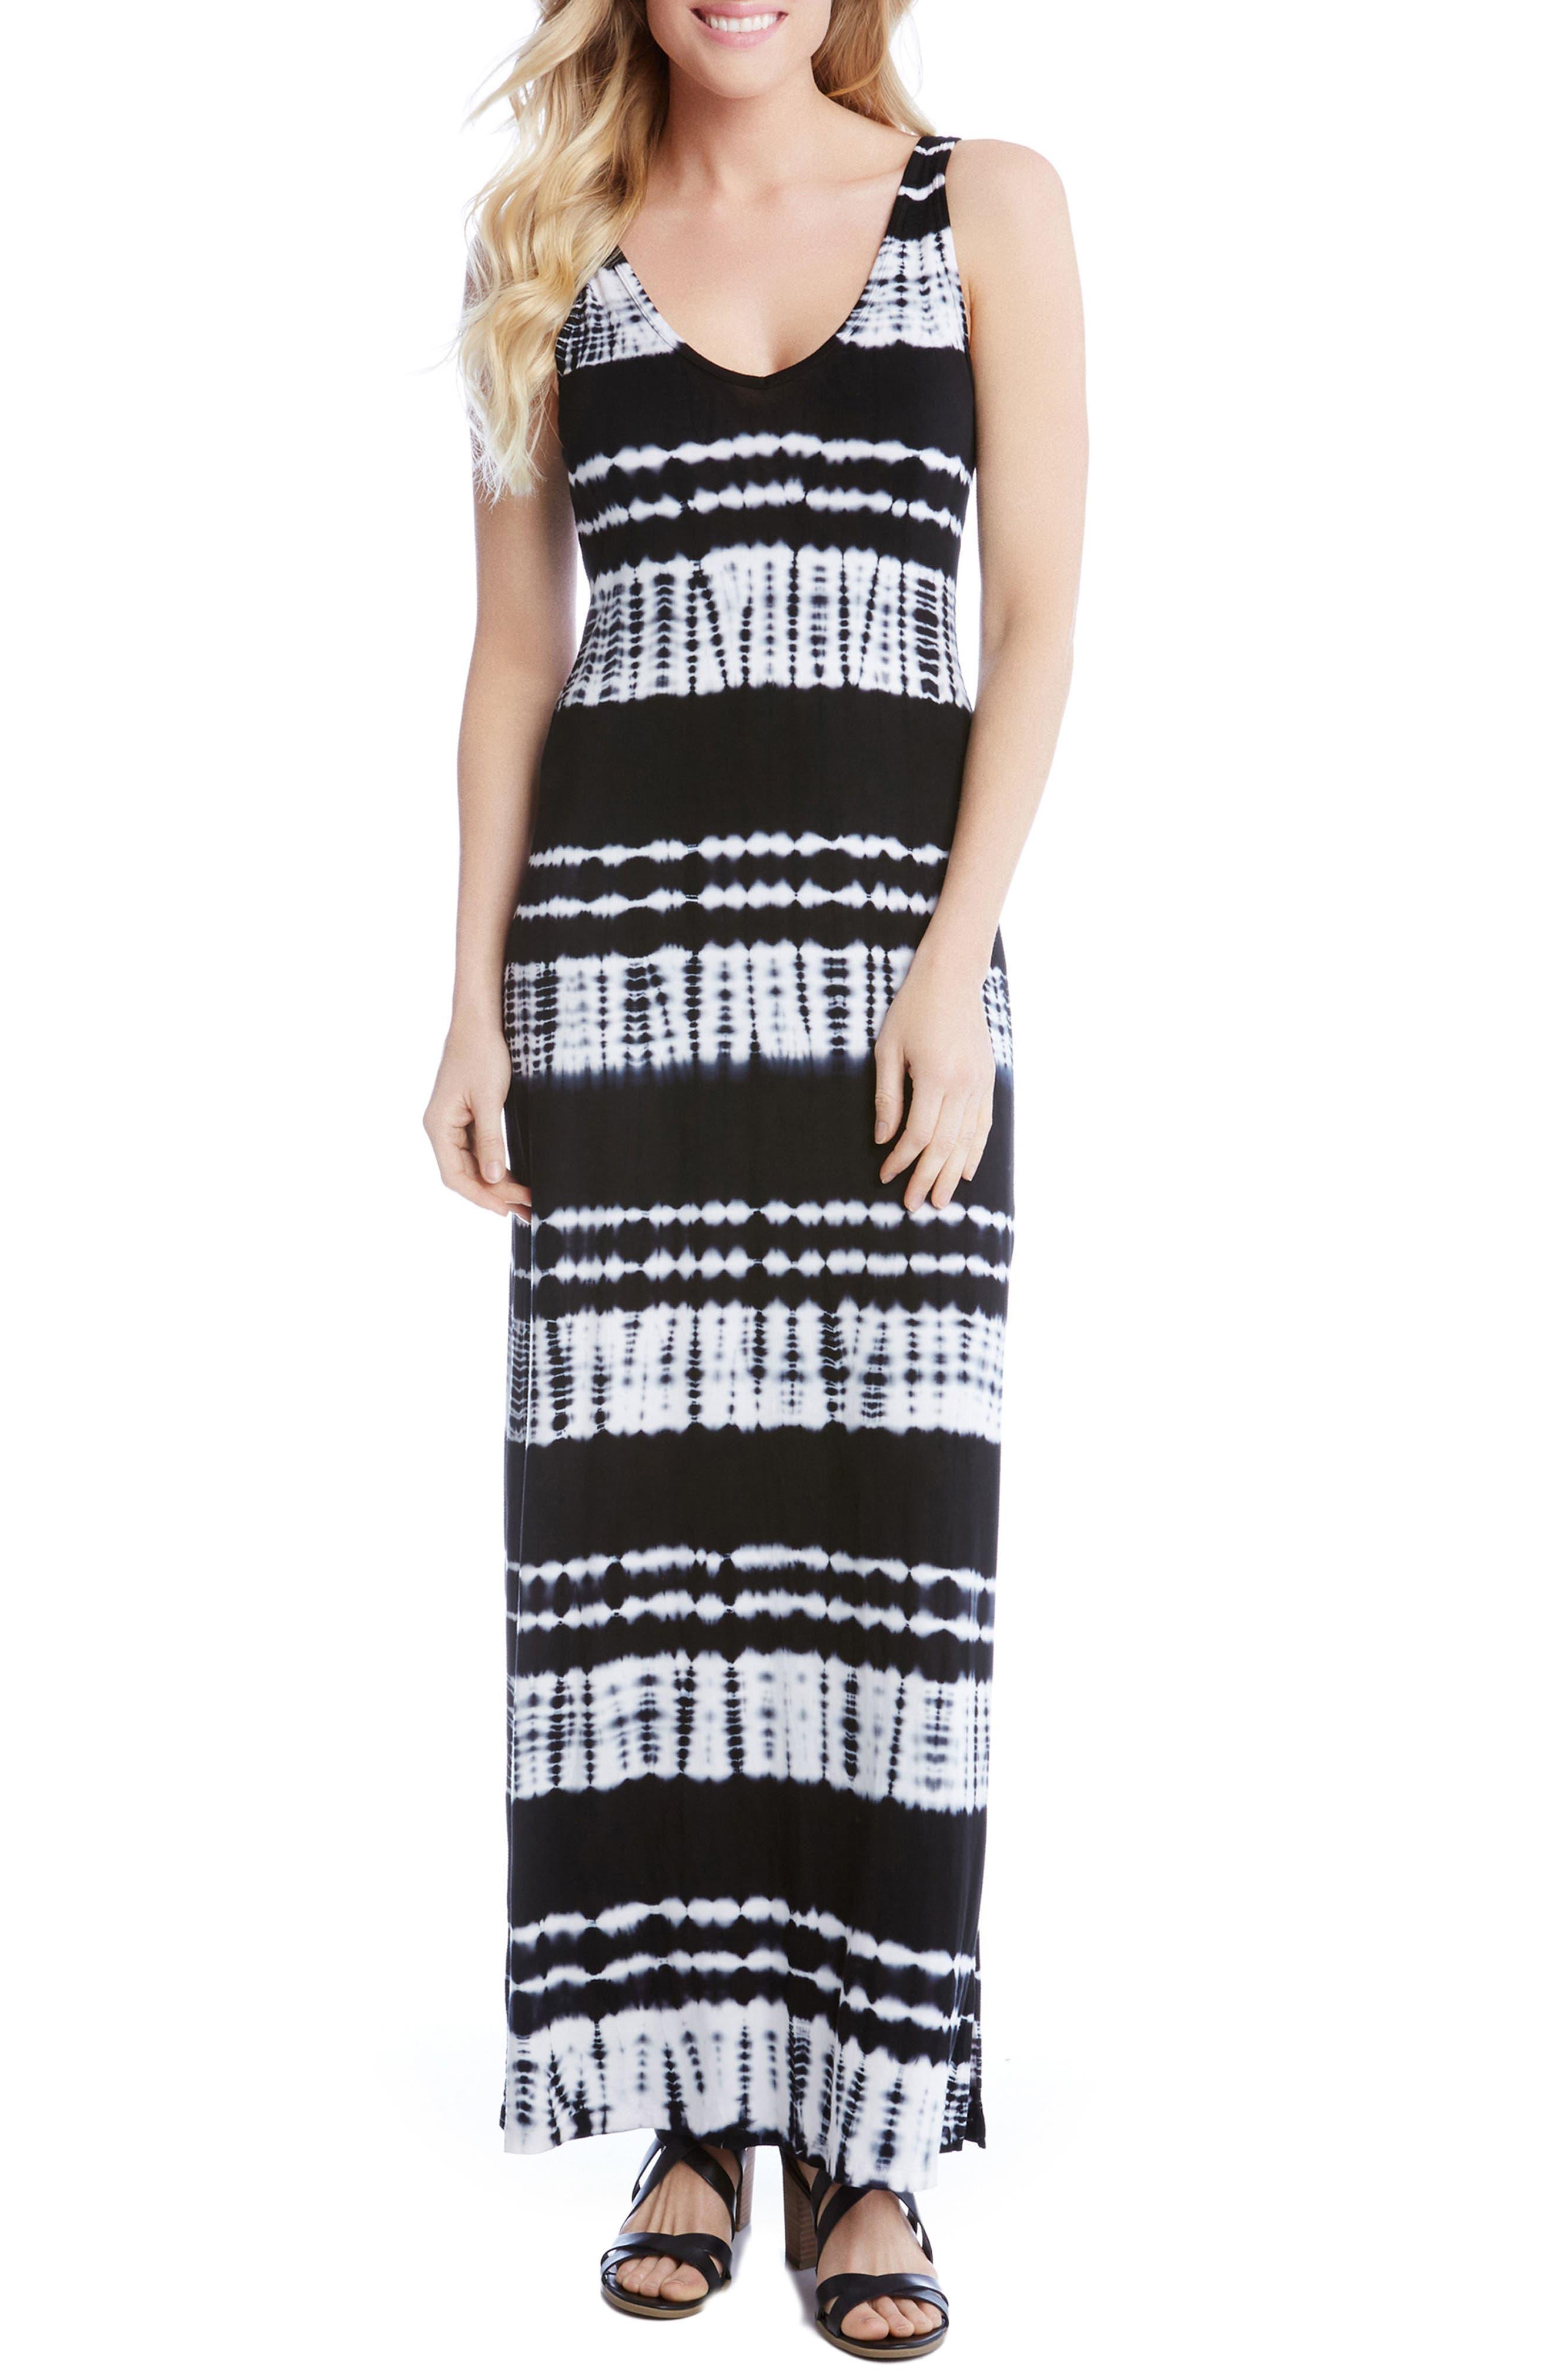 Alternate Image 1 Selected - Karen Kane Alana Tie Dye Maxi Dress